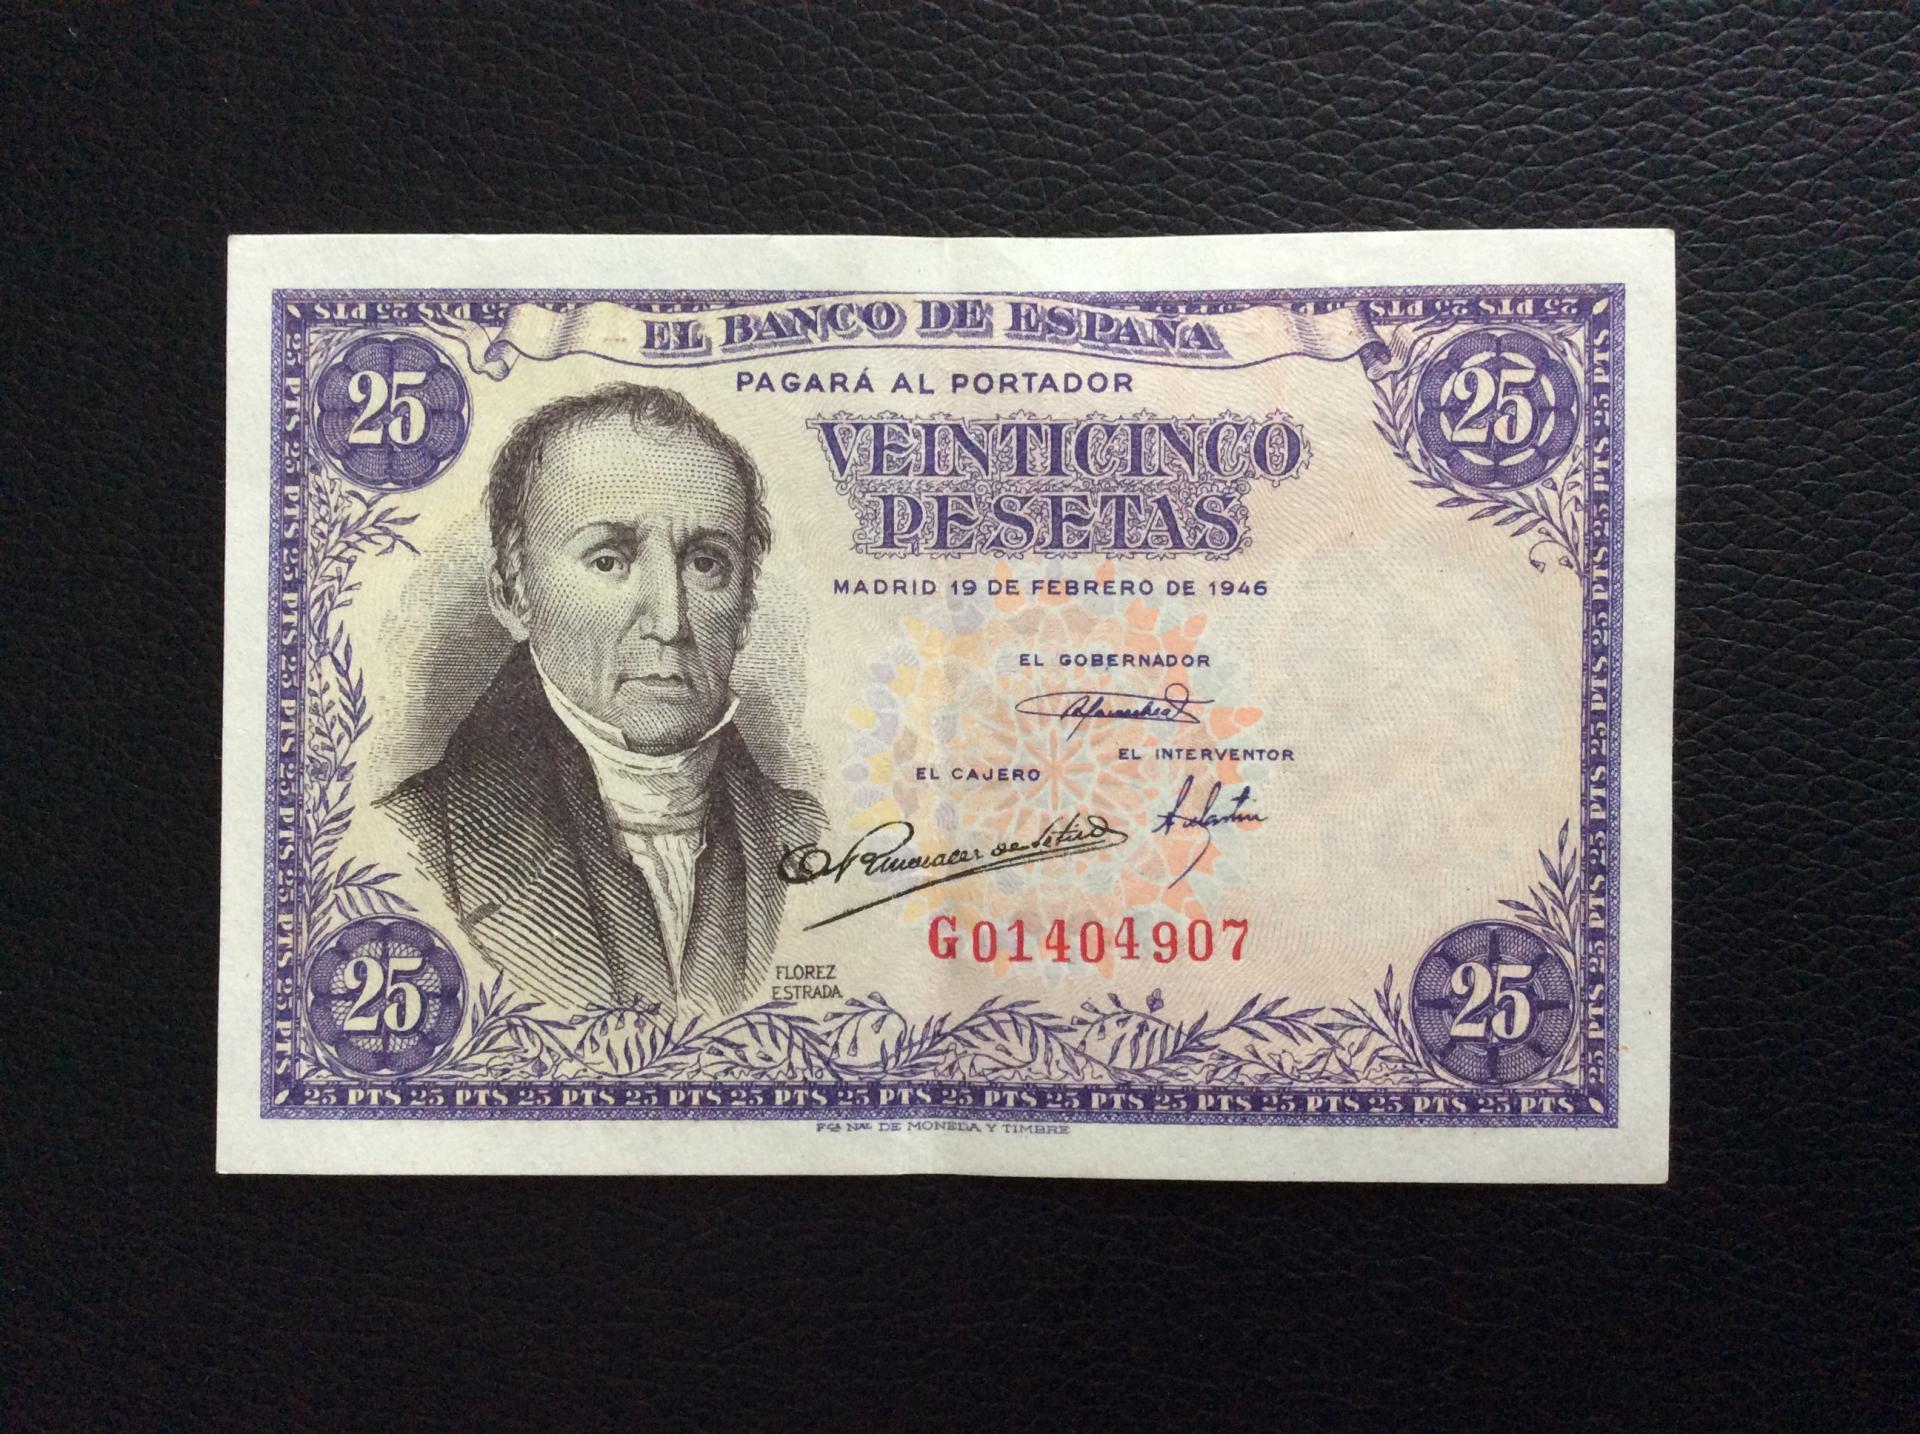 25 PESETAS 1946 - FLÓREZ ESTRADA